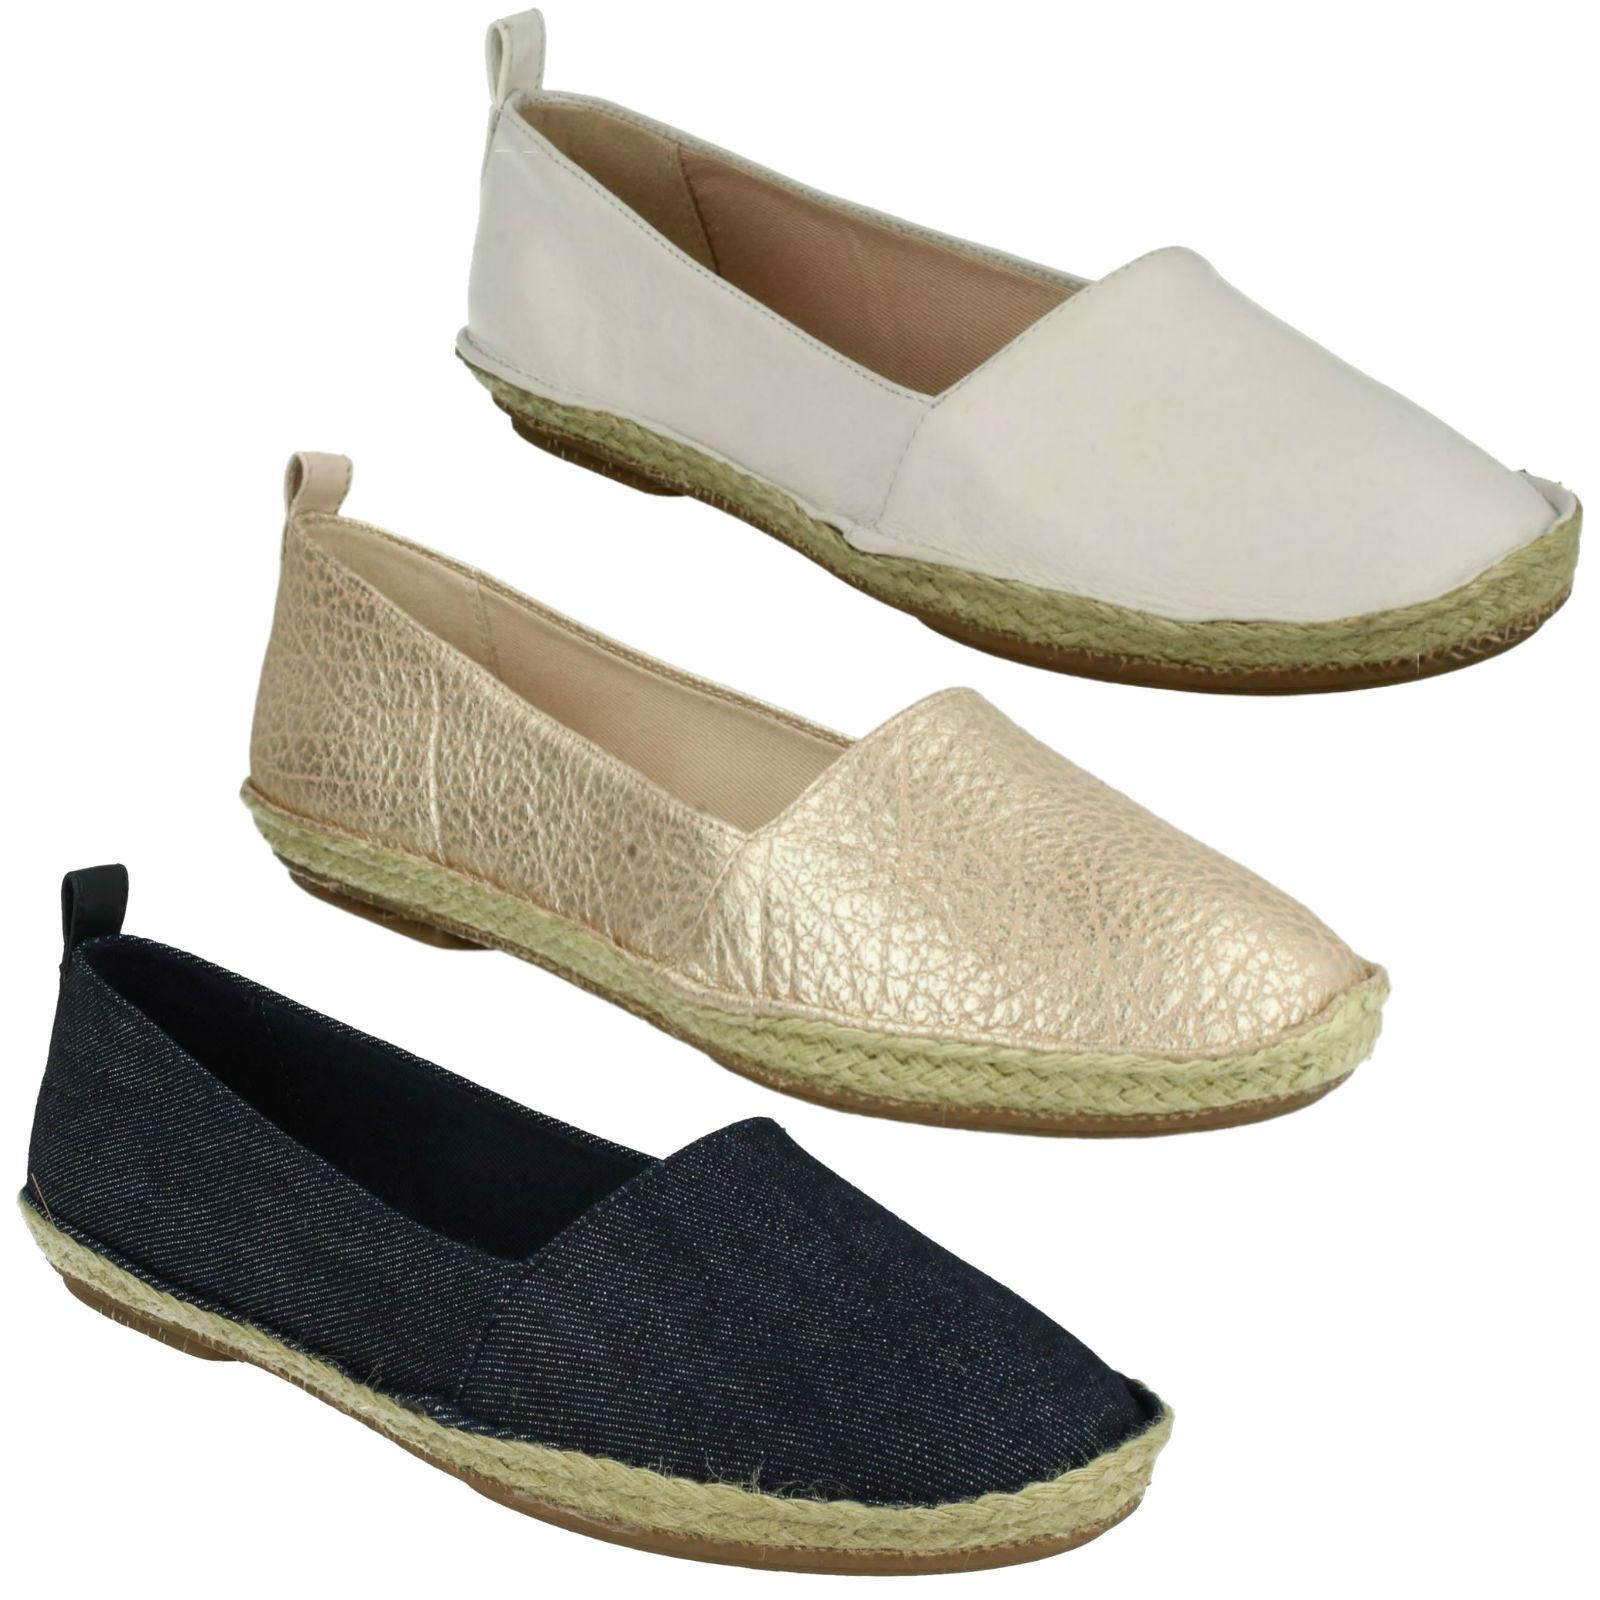 Clovelly SOLE infilare Clarks da donna in pelle da infilare SOLE scarpe estive espadrille e1ebee